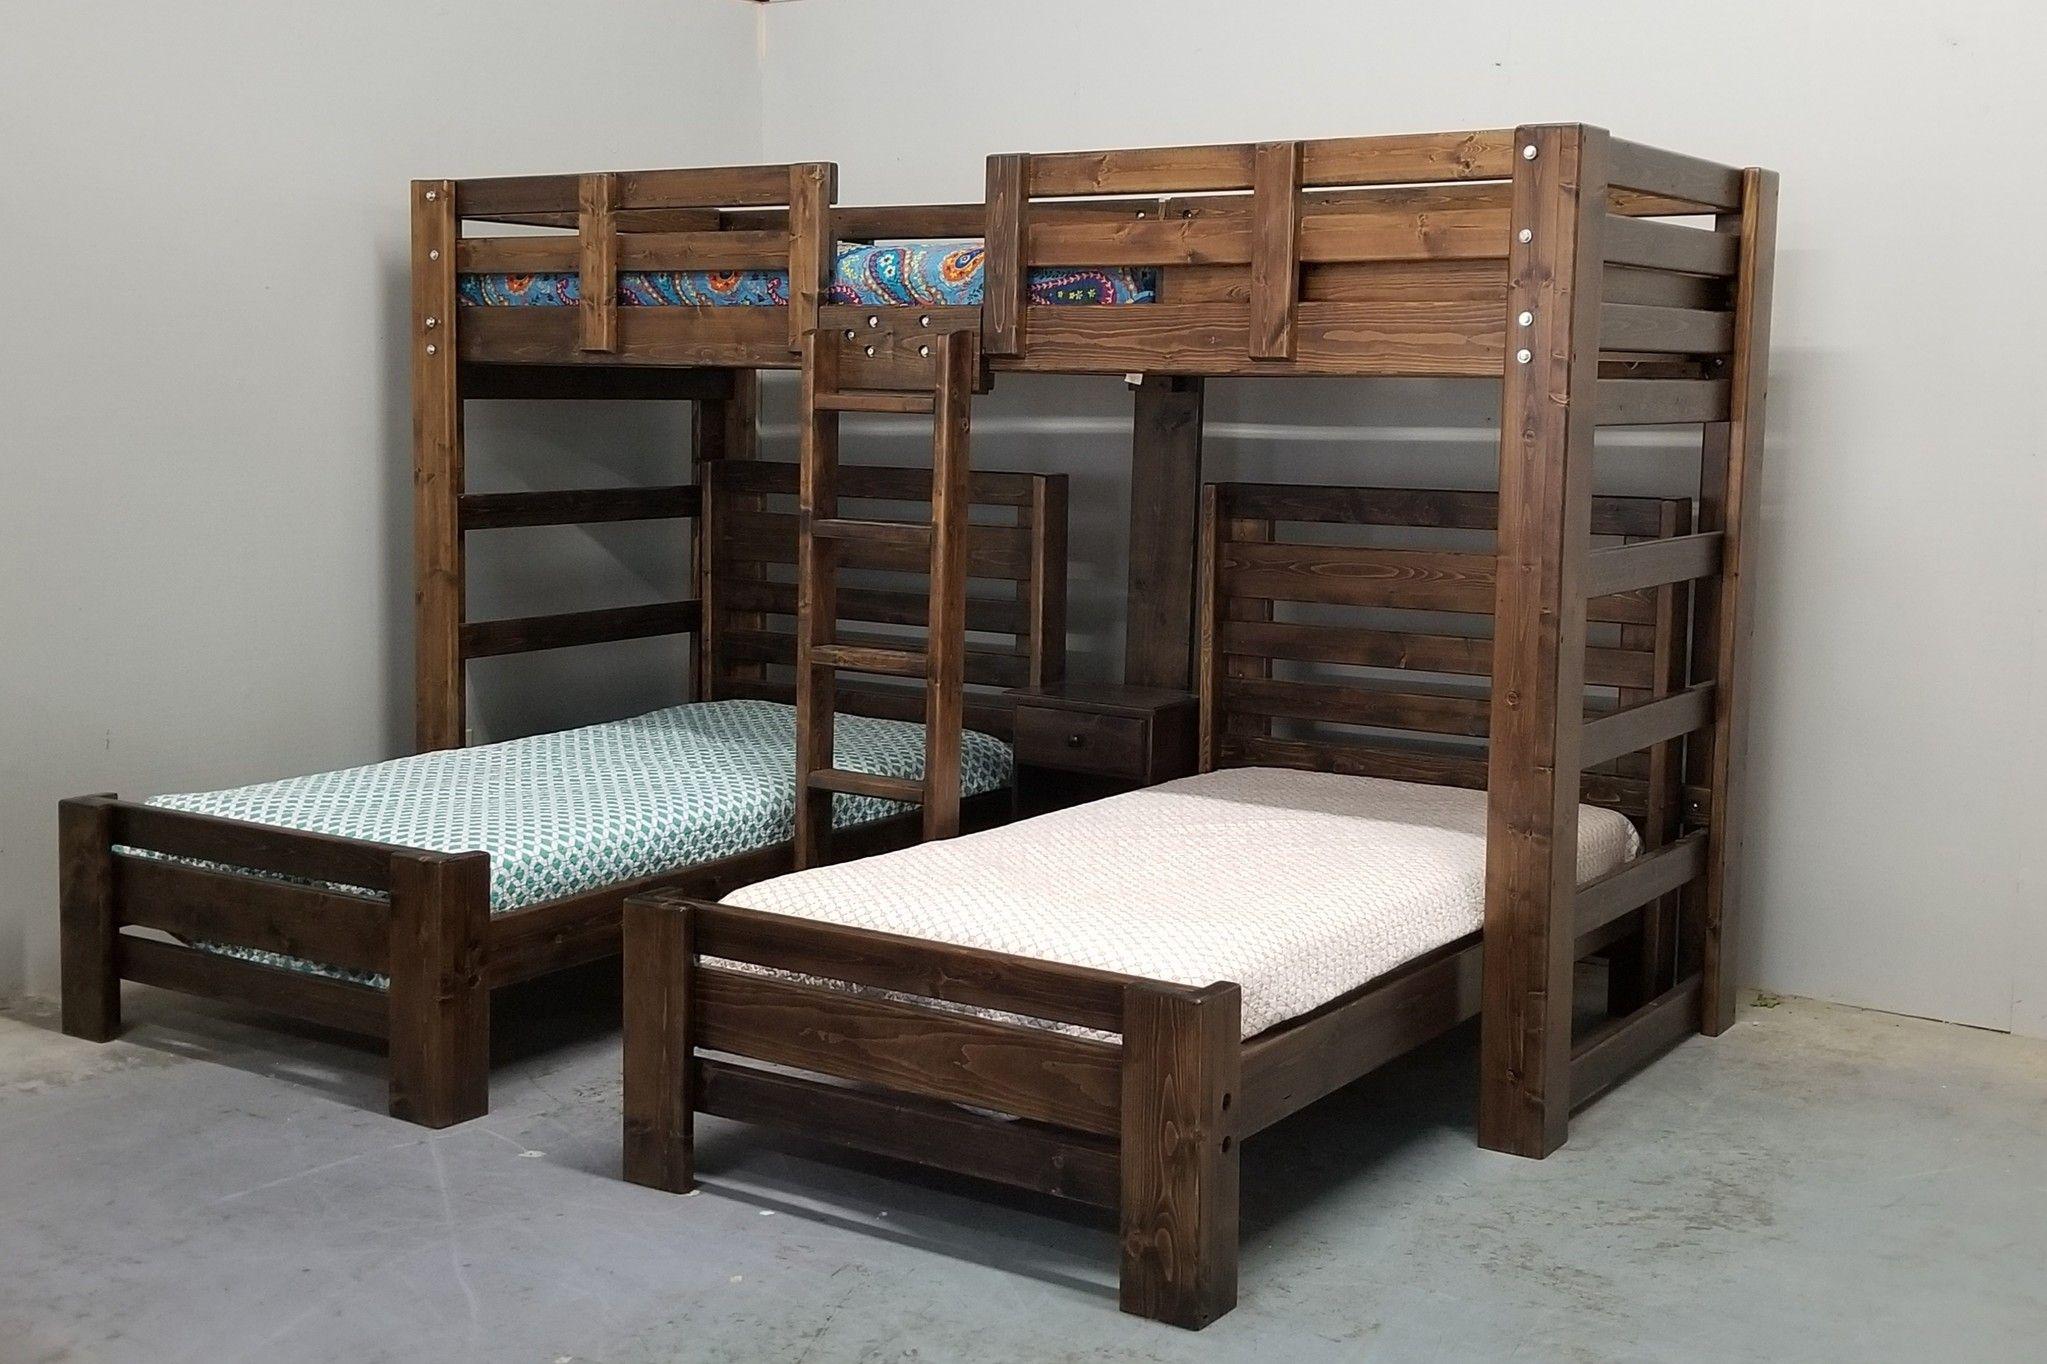 Hat Trick Triple Bunk W 2 Plank Beds Bunk Bed Sets Diy Bunk Bed Triple Bunk Beds